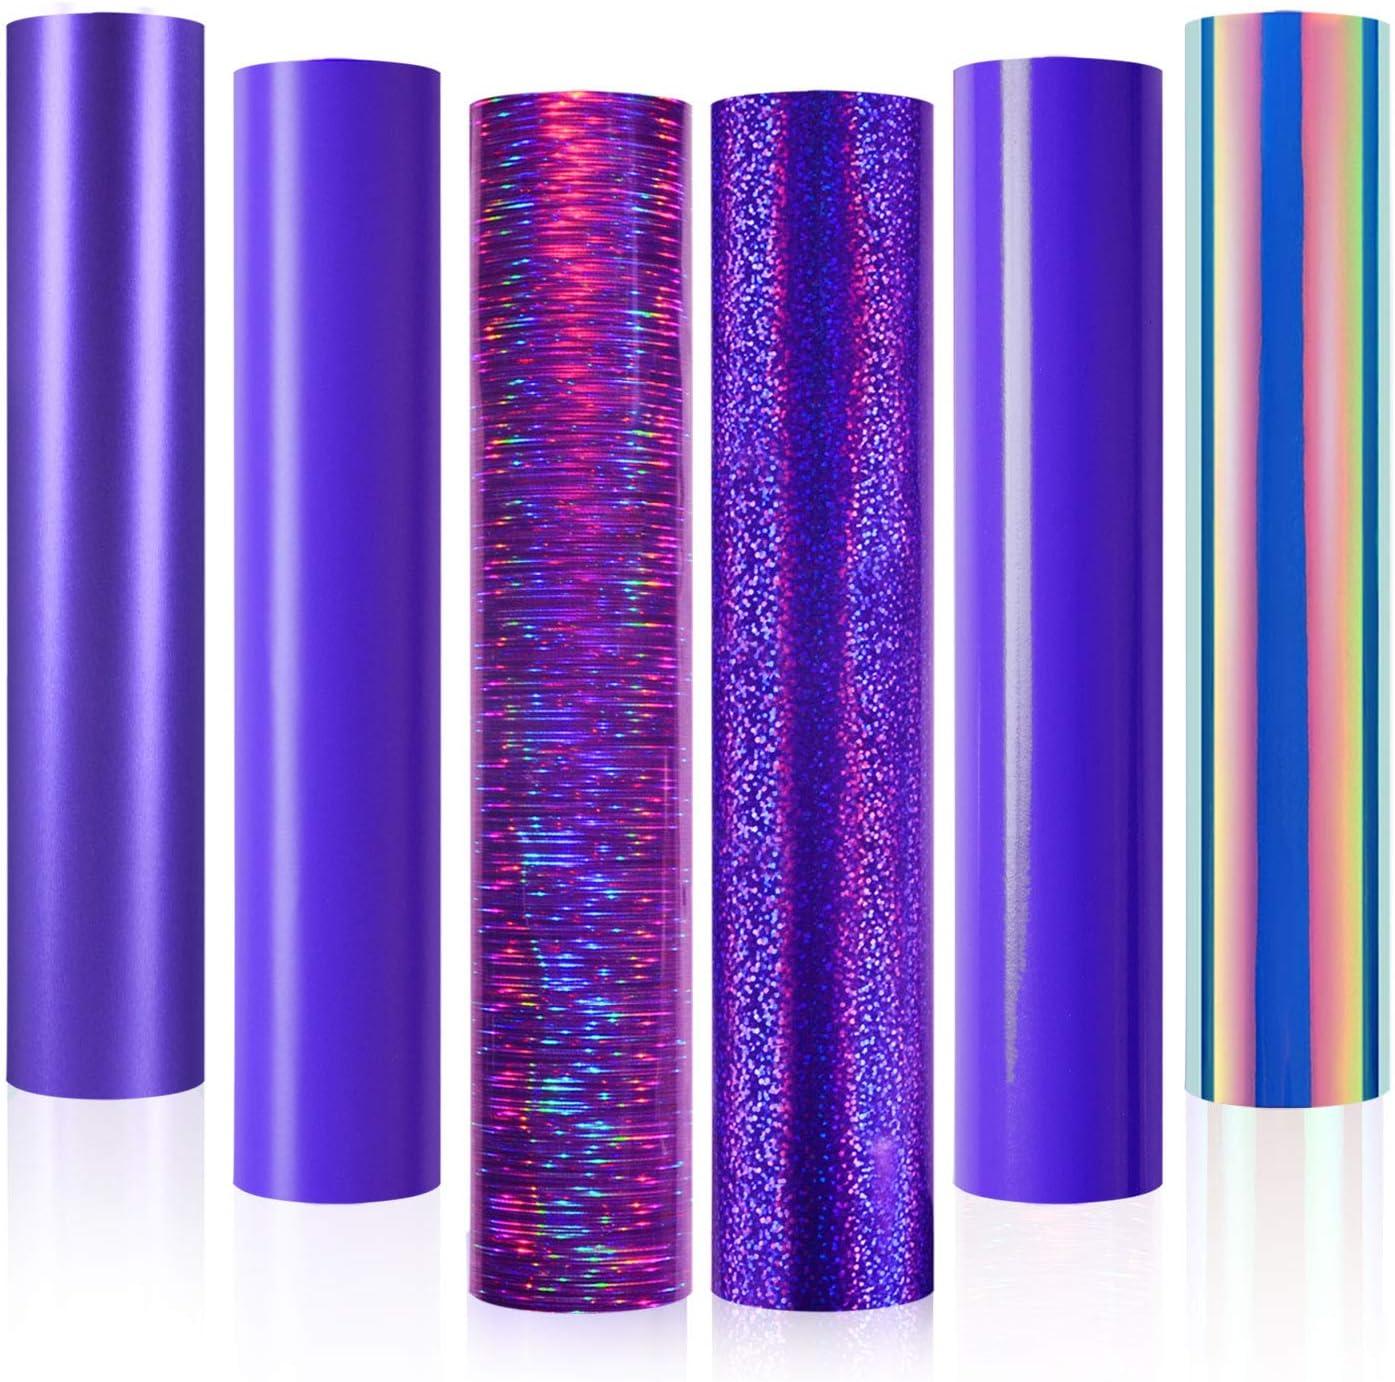 Purple Vinyl,Holographic Opal Chrome Purple Adhesive Craft Vinyl, Permanent Purple Vinyl Sheets 12 Inch X 12 Inch ,6 Sheets for Cricut and Silhouette, Cameo,Purple